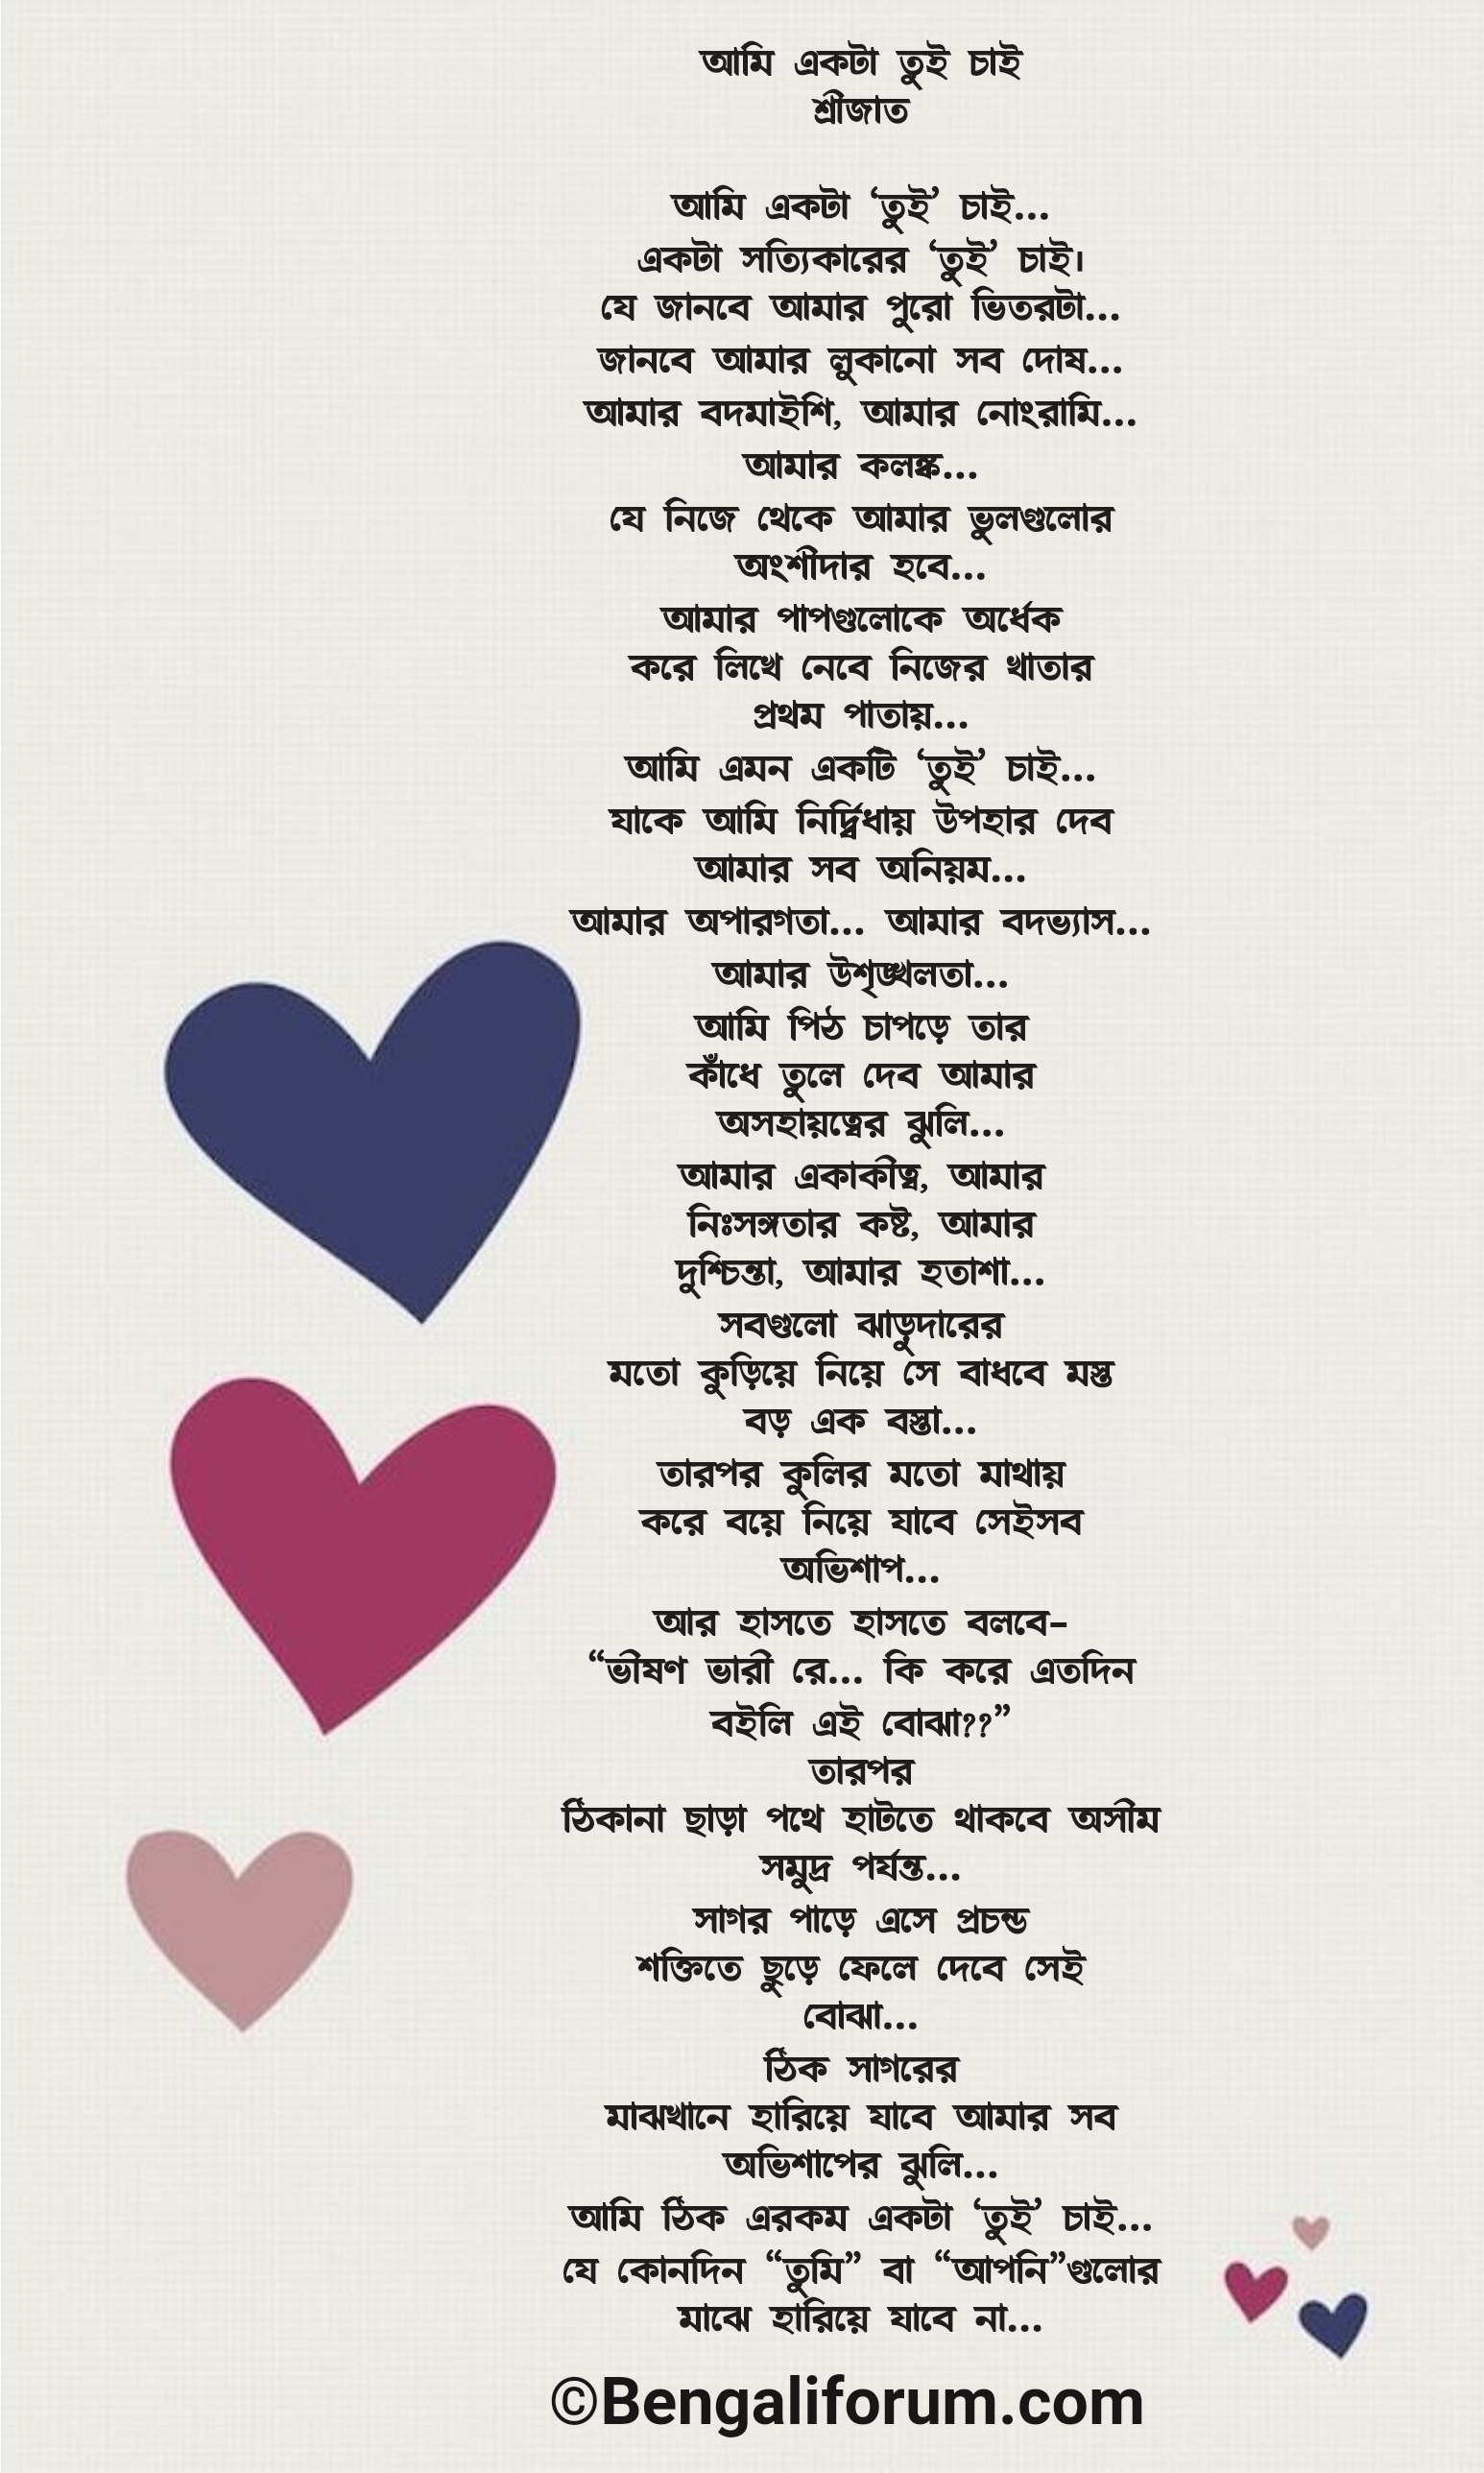 Ami ekta tui chai kobita lyrics in Bengali   Srijato   Bengali love poem   আমি একটা তুই চাই